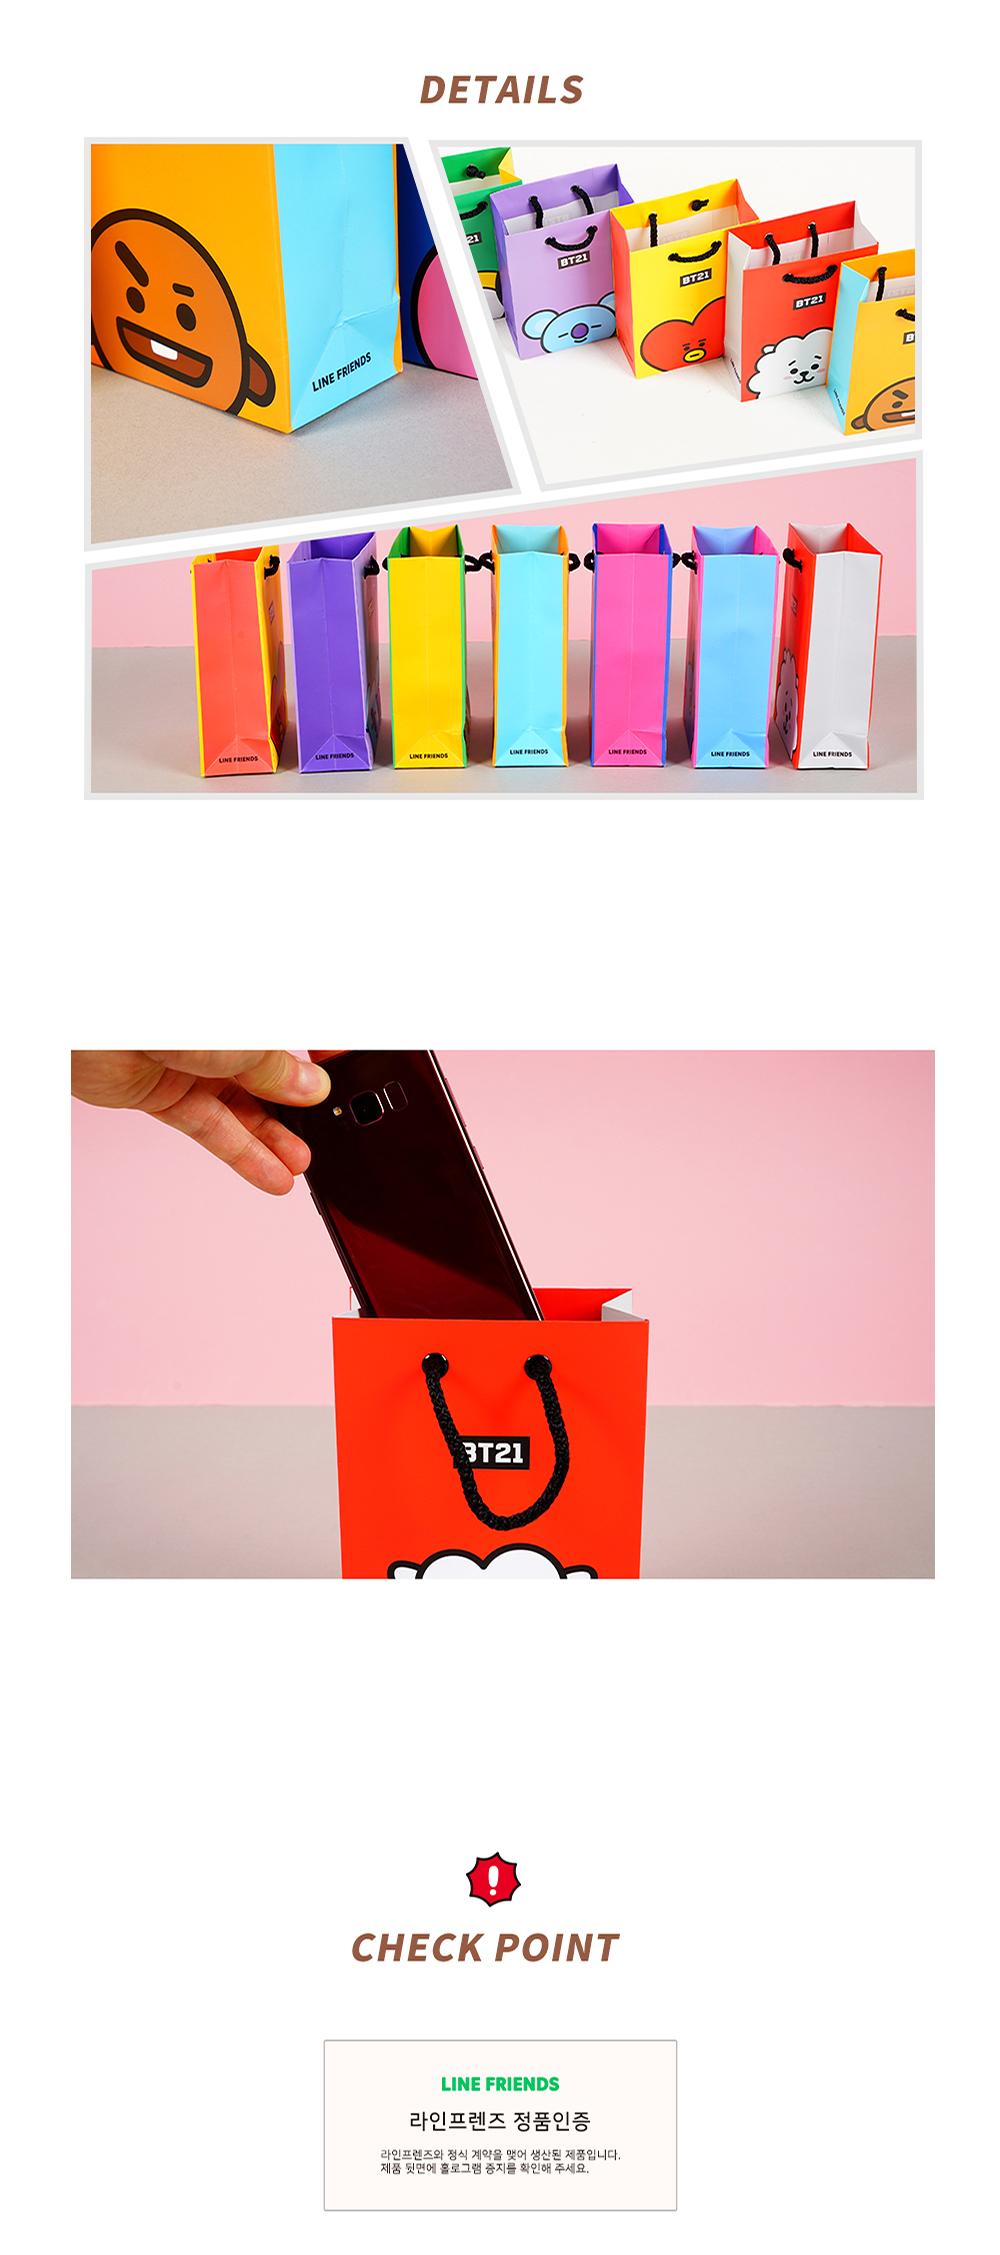 bt21_kf_shopingbags_03.jpg